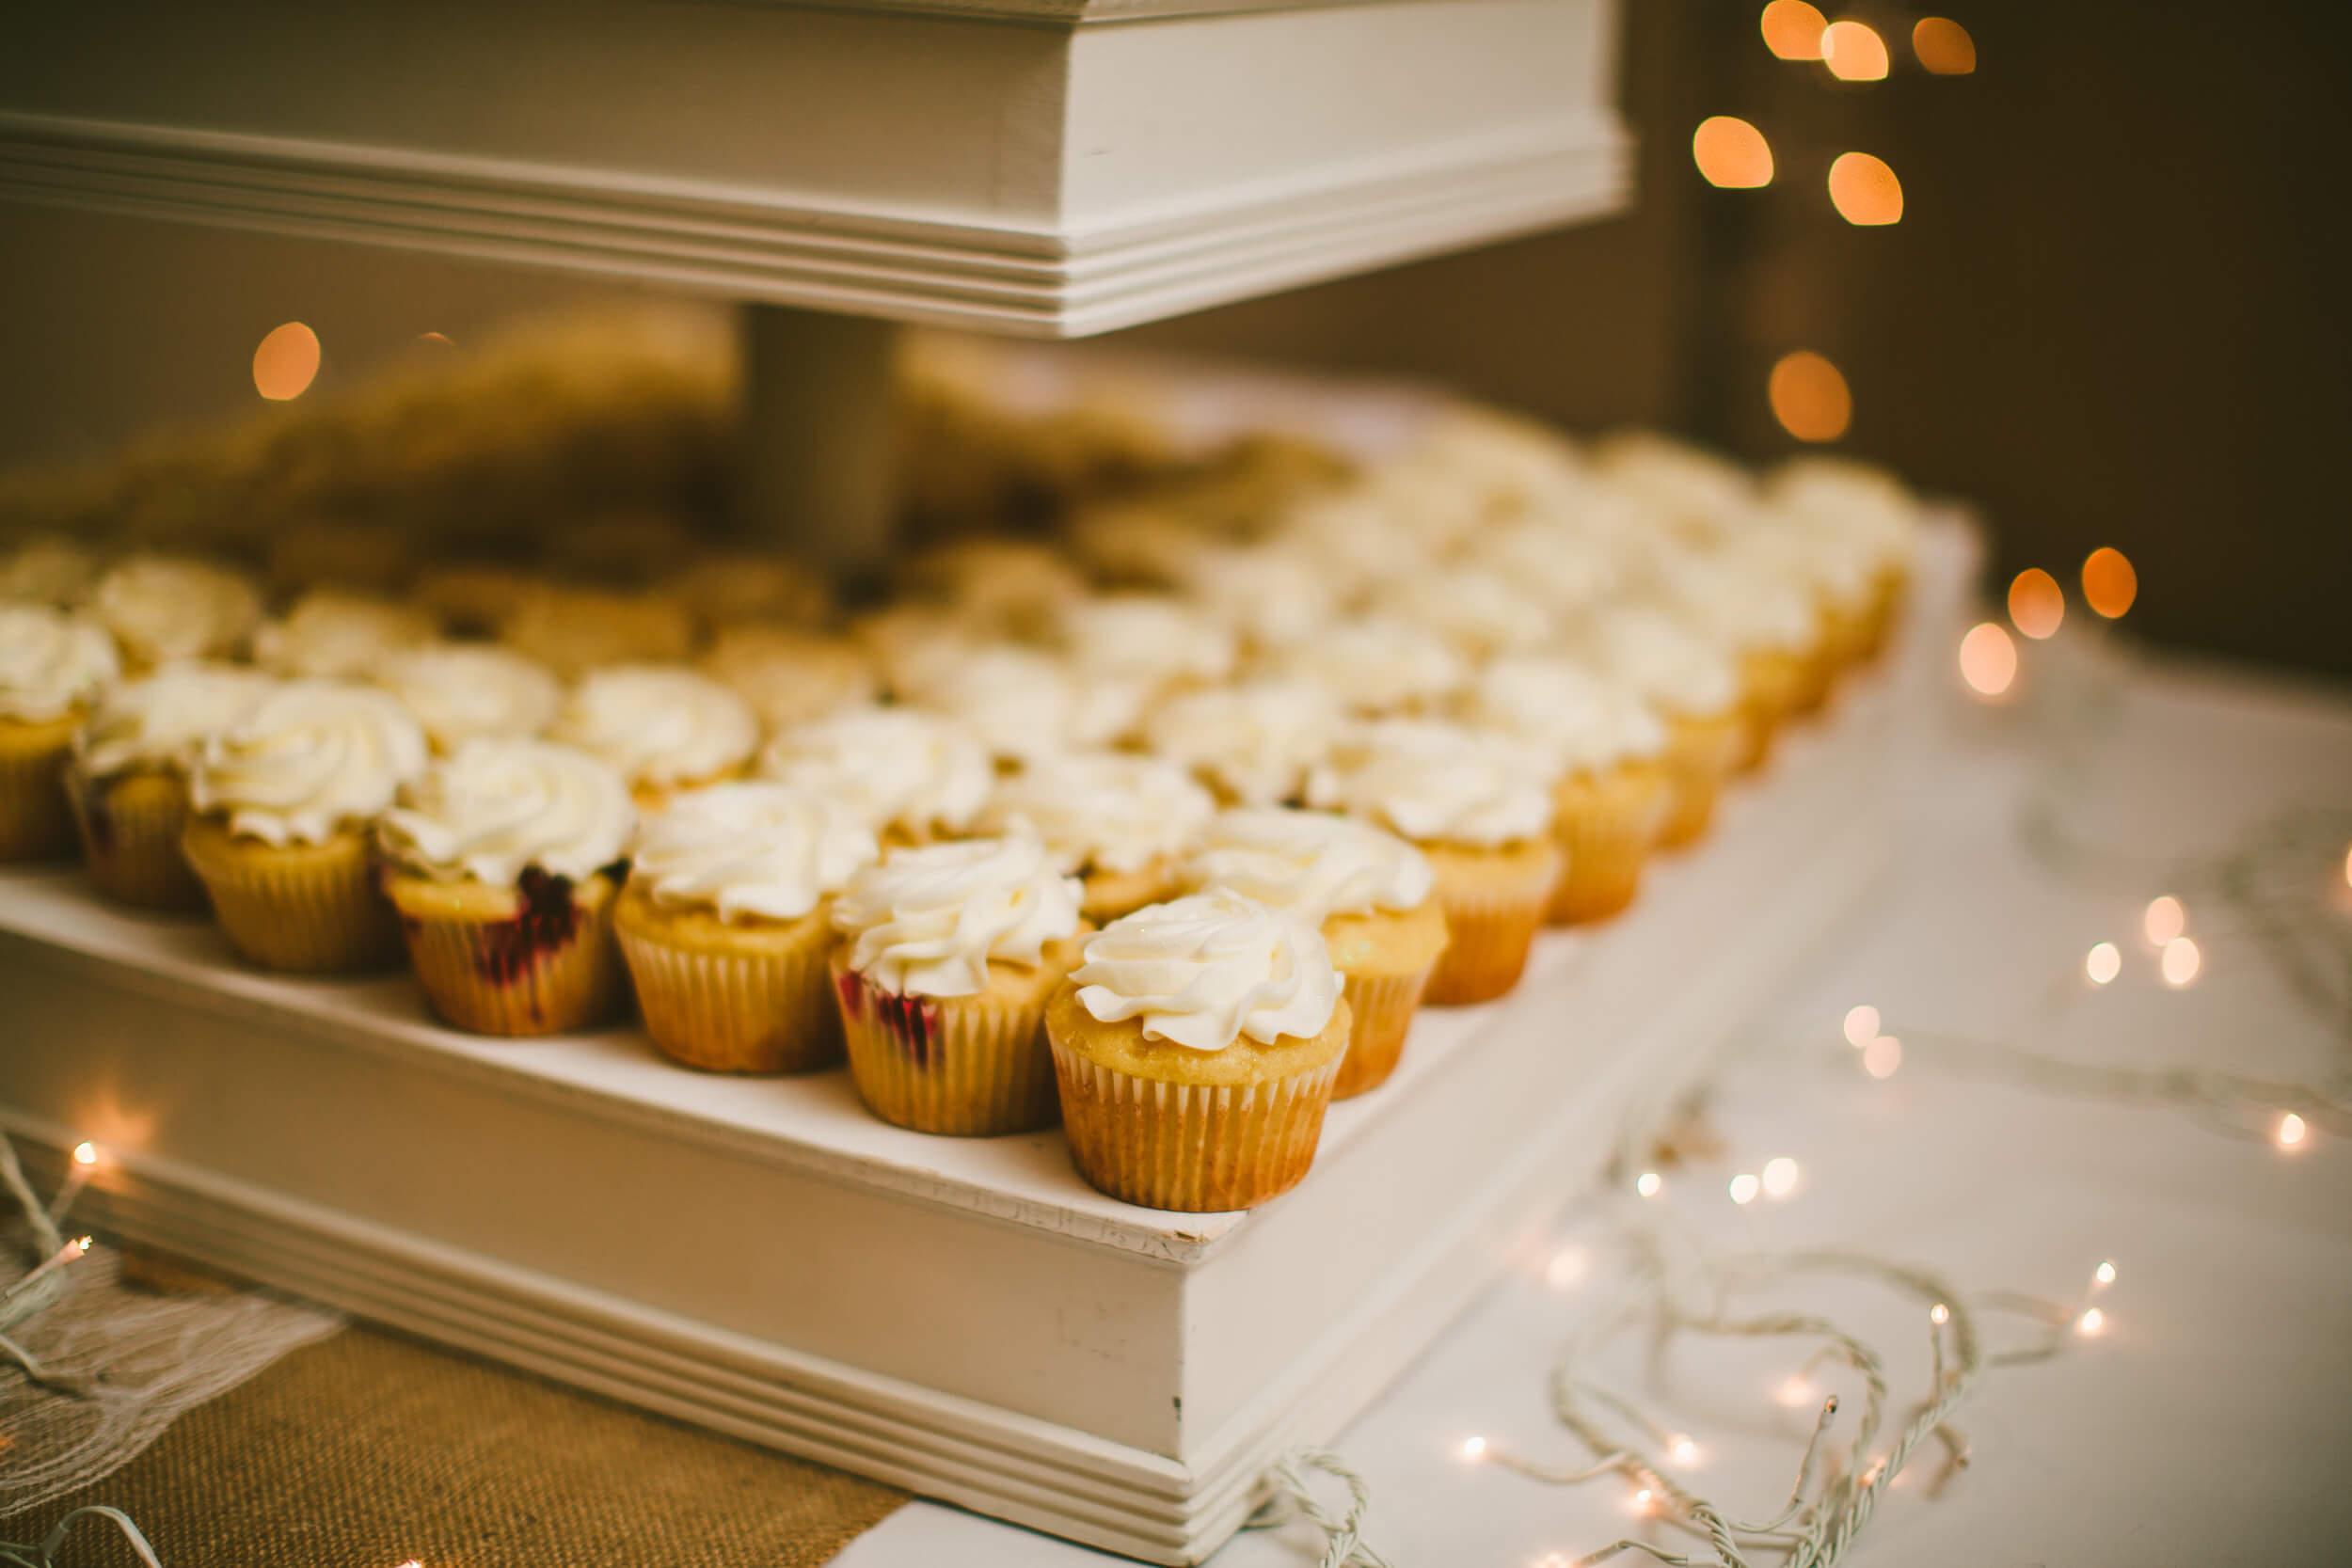 mukogawa winter wedding in spokane (201).jpg